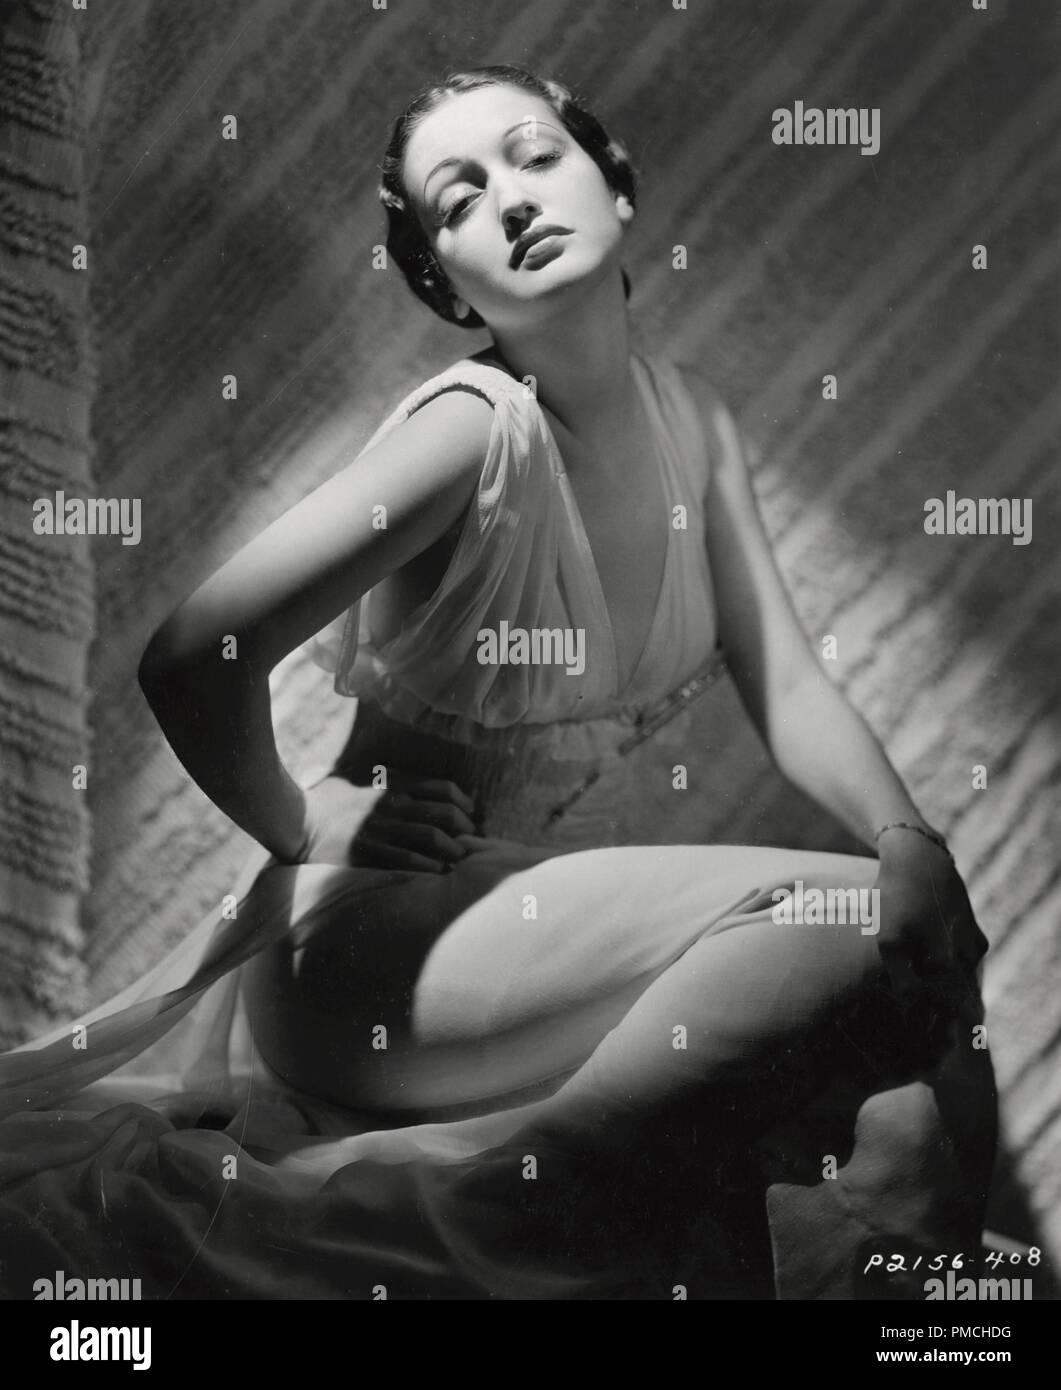 nude Erotica Dorothy Lamour (15 photo) Paparazzi, Facebook, see through